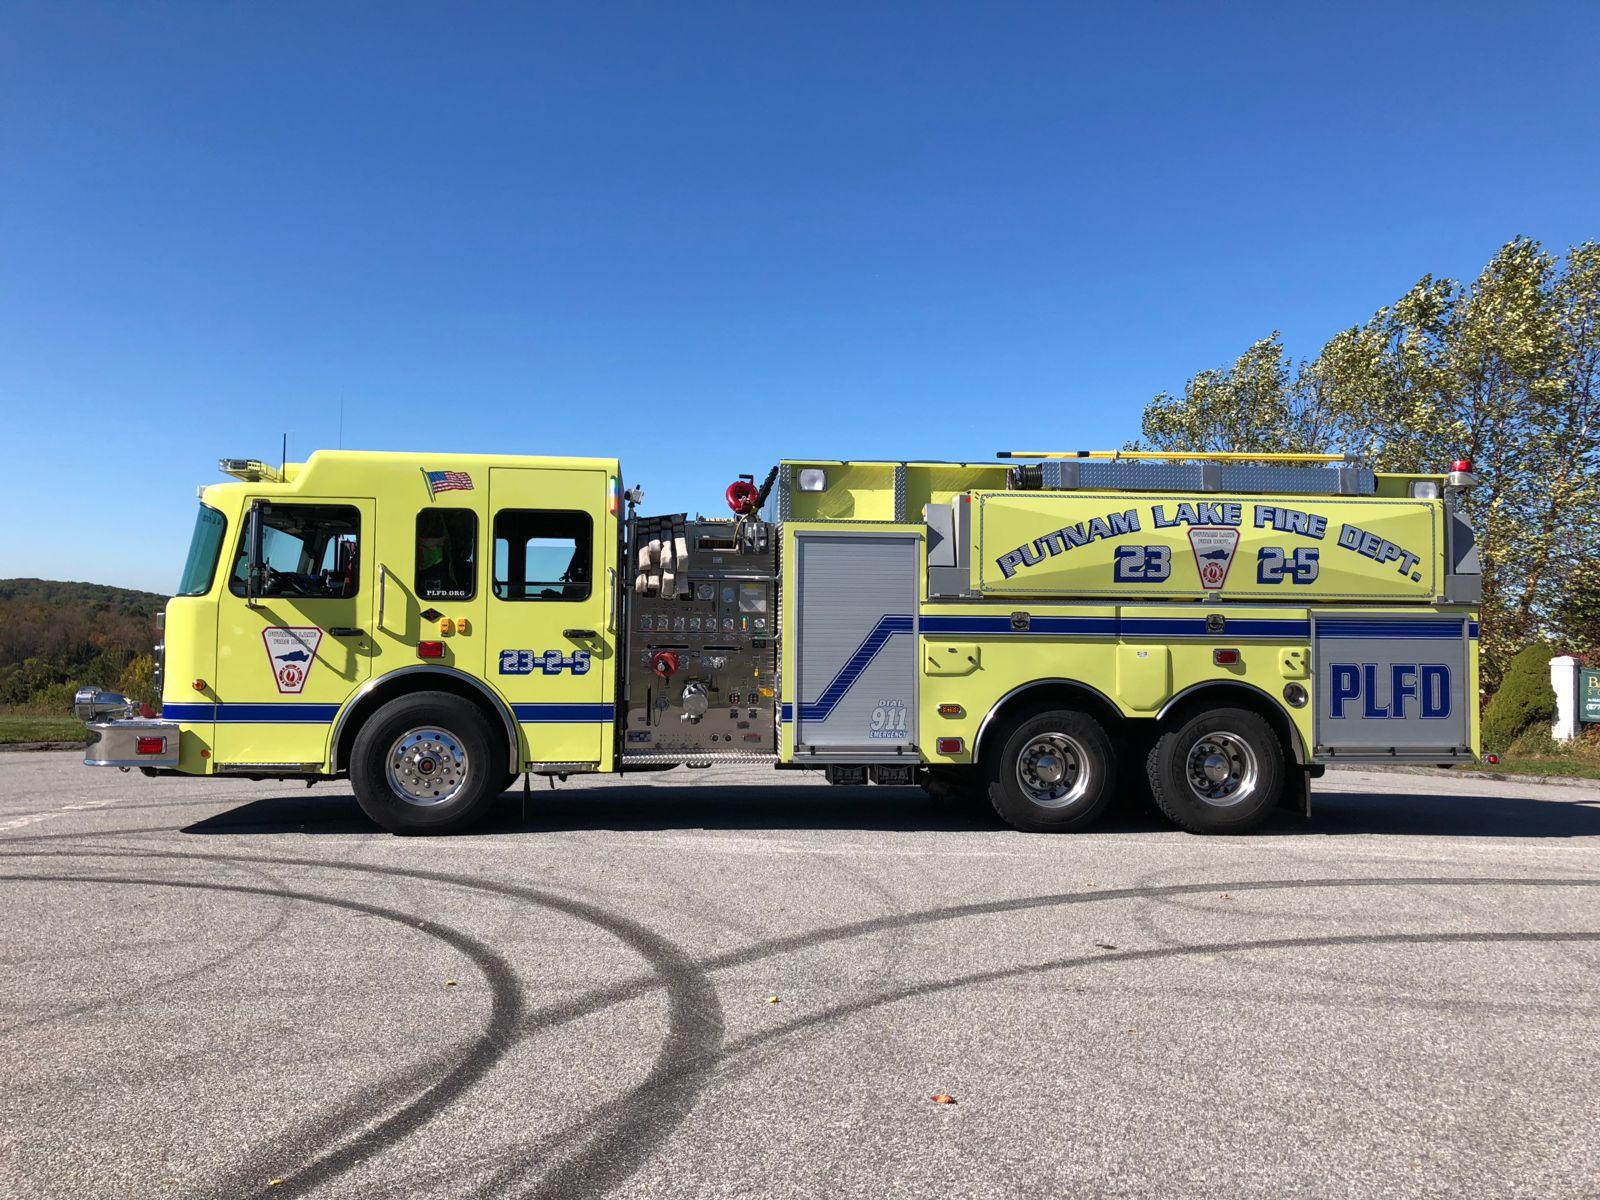 Putnam Lake Fire Department